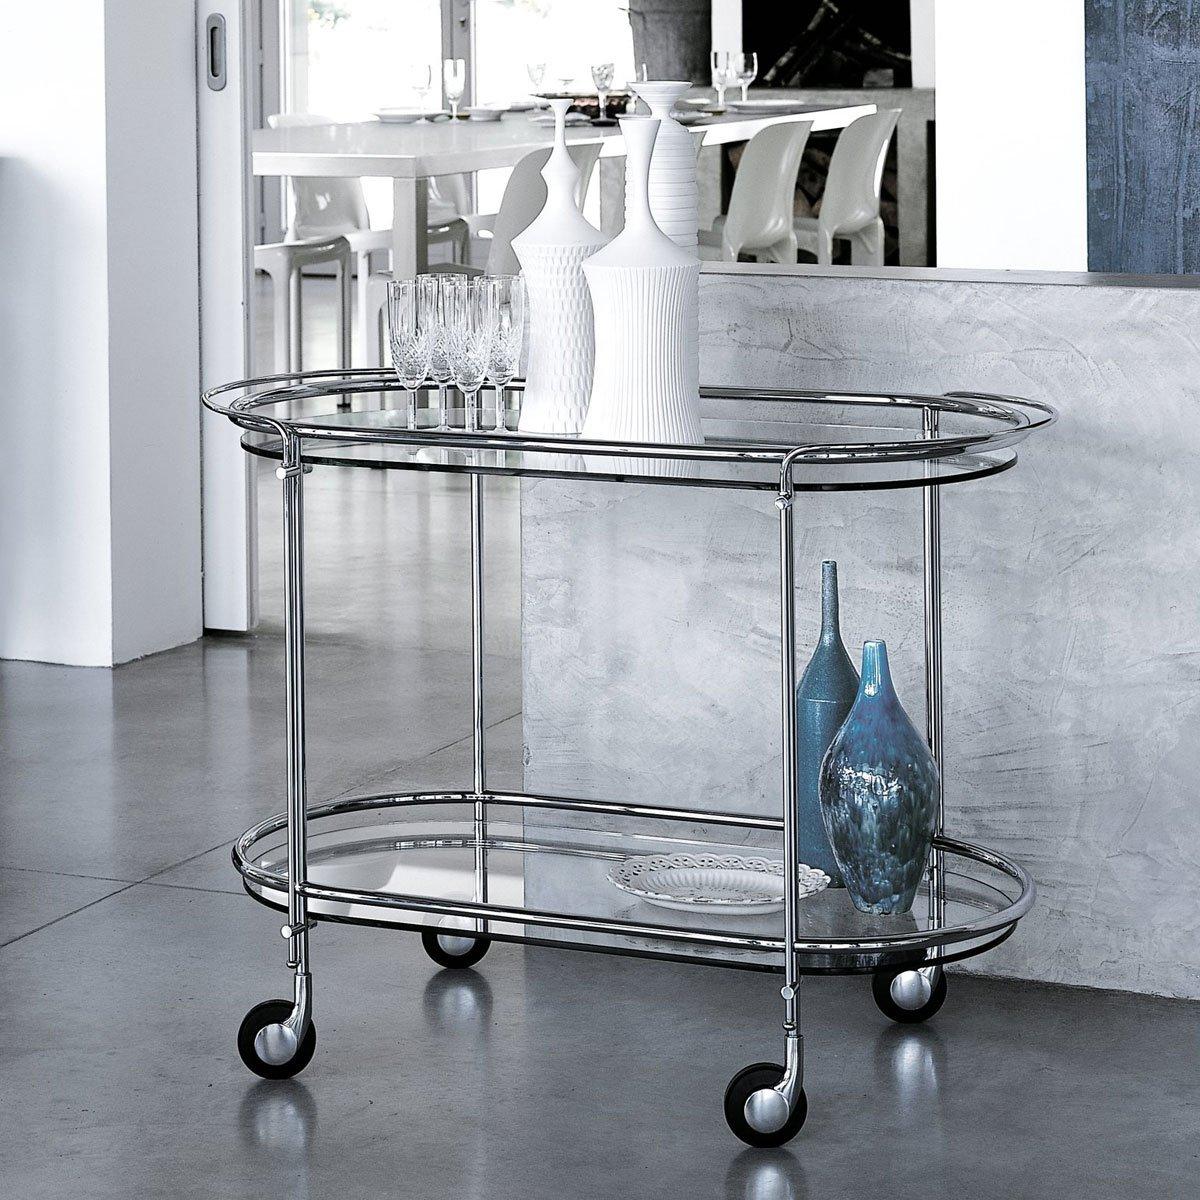 Riki Glass And Metal Trolley By Gallotti Radice